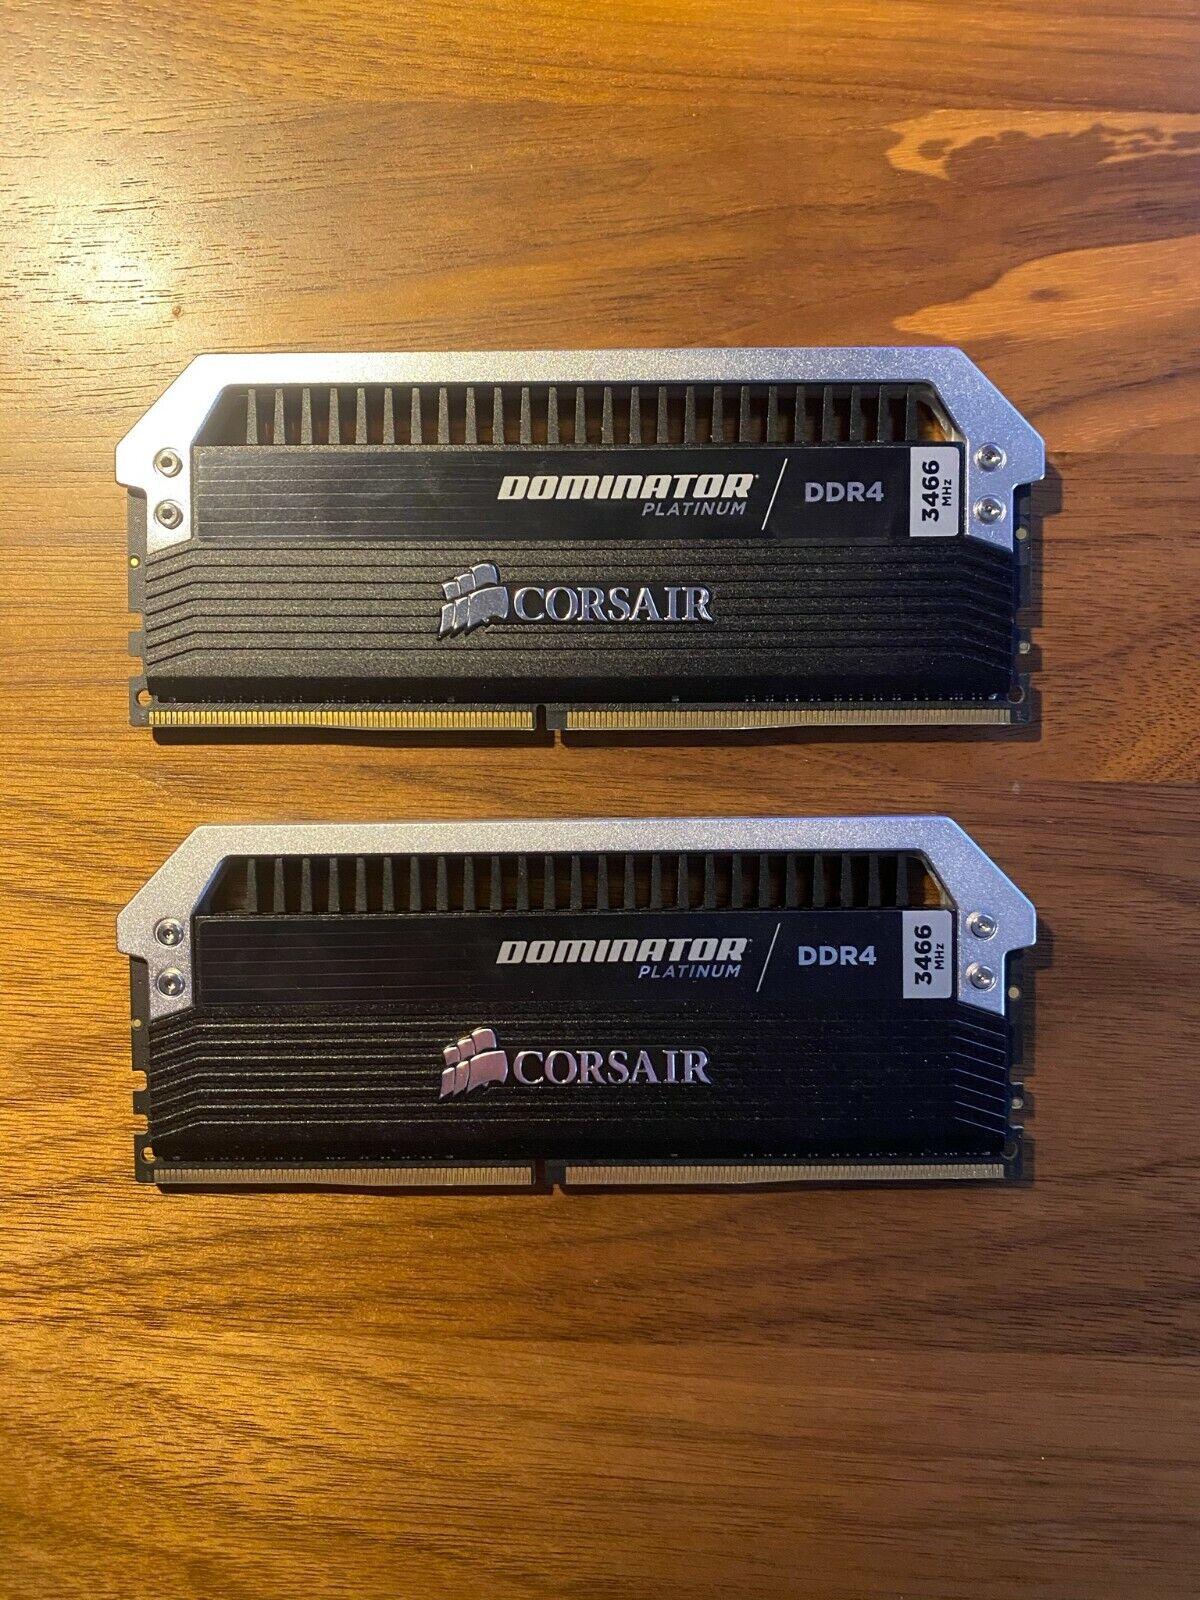 32GB Corsair Dominator Platinum DDR4 3466MHz CL16 Dual Kit 2x16GB. Buy it now for 200.00